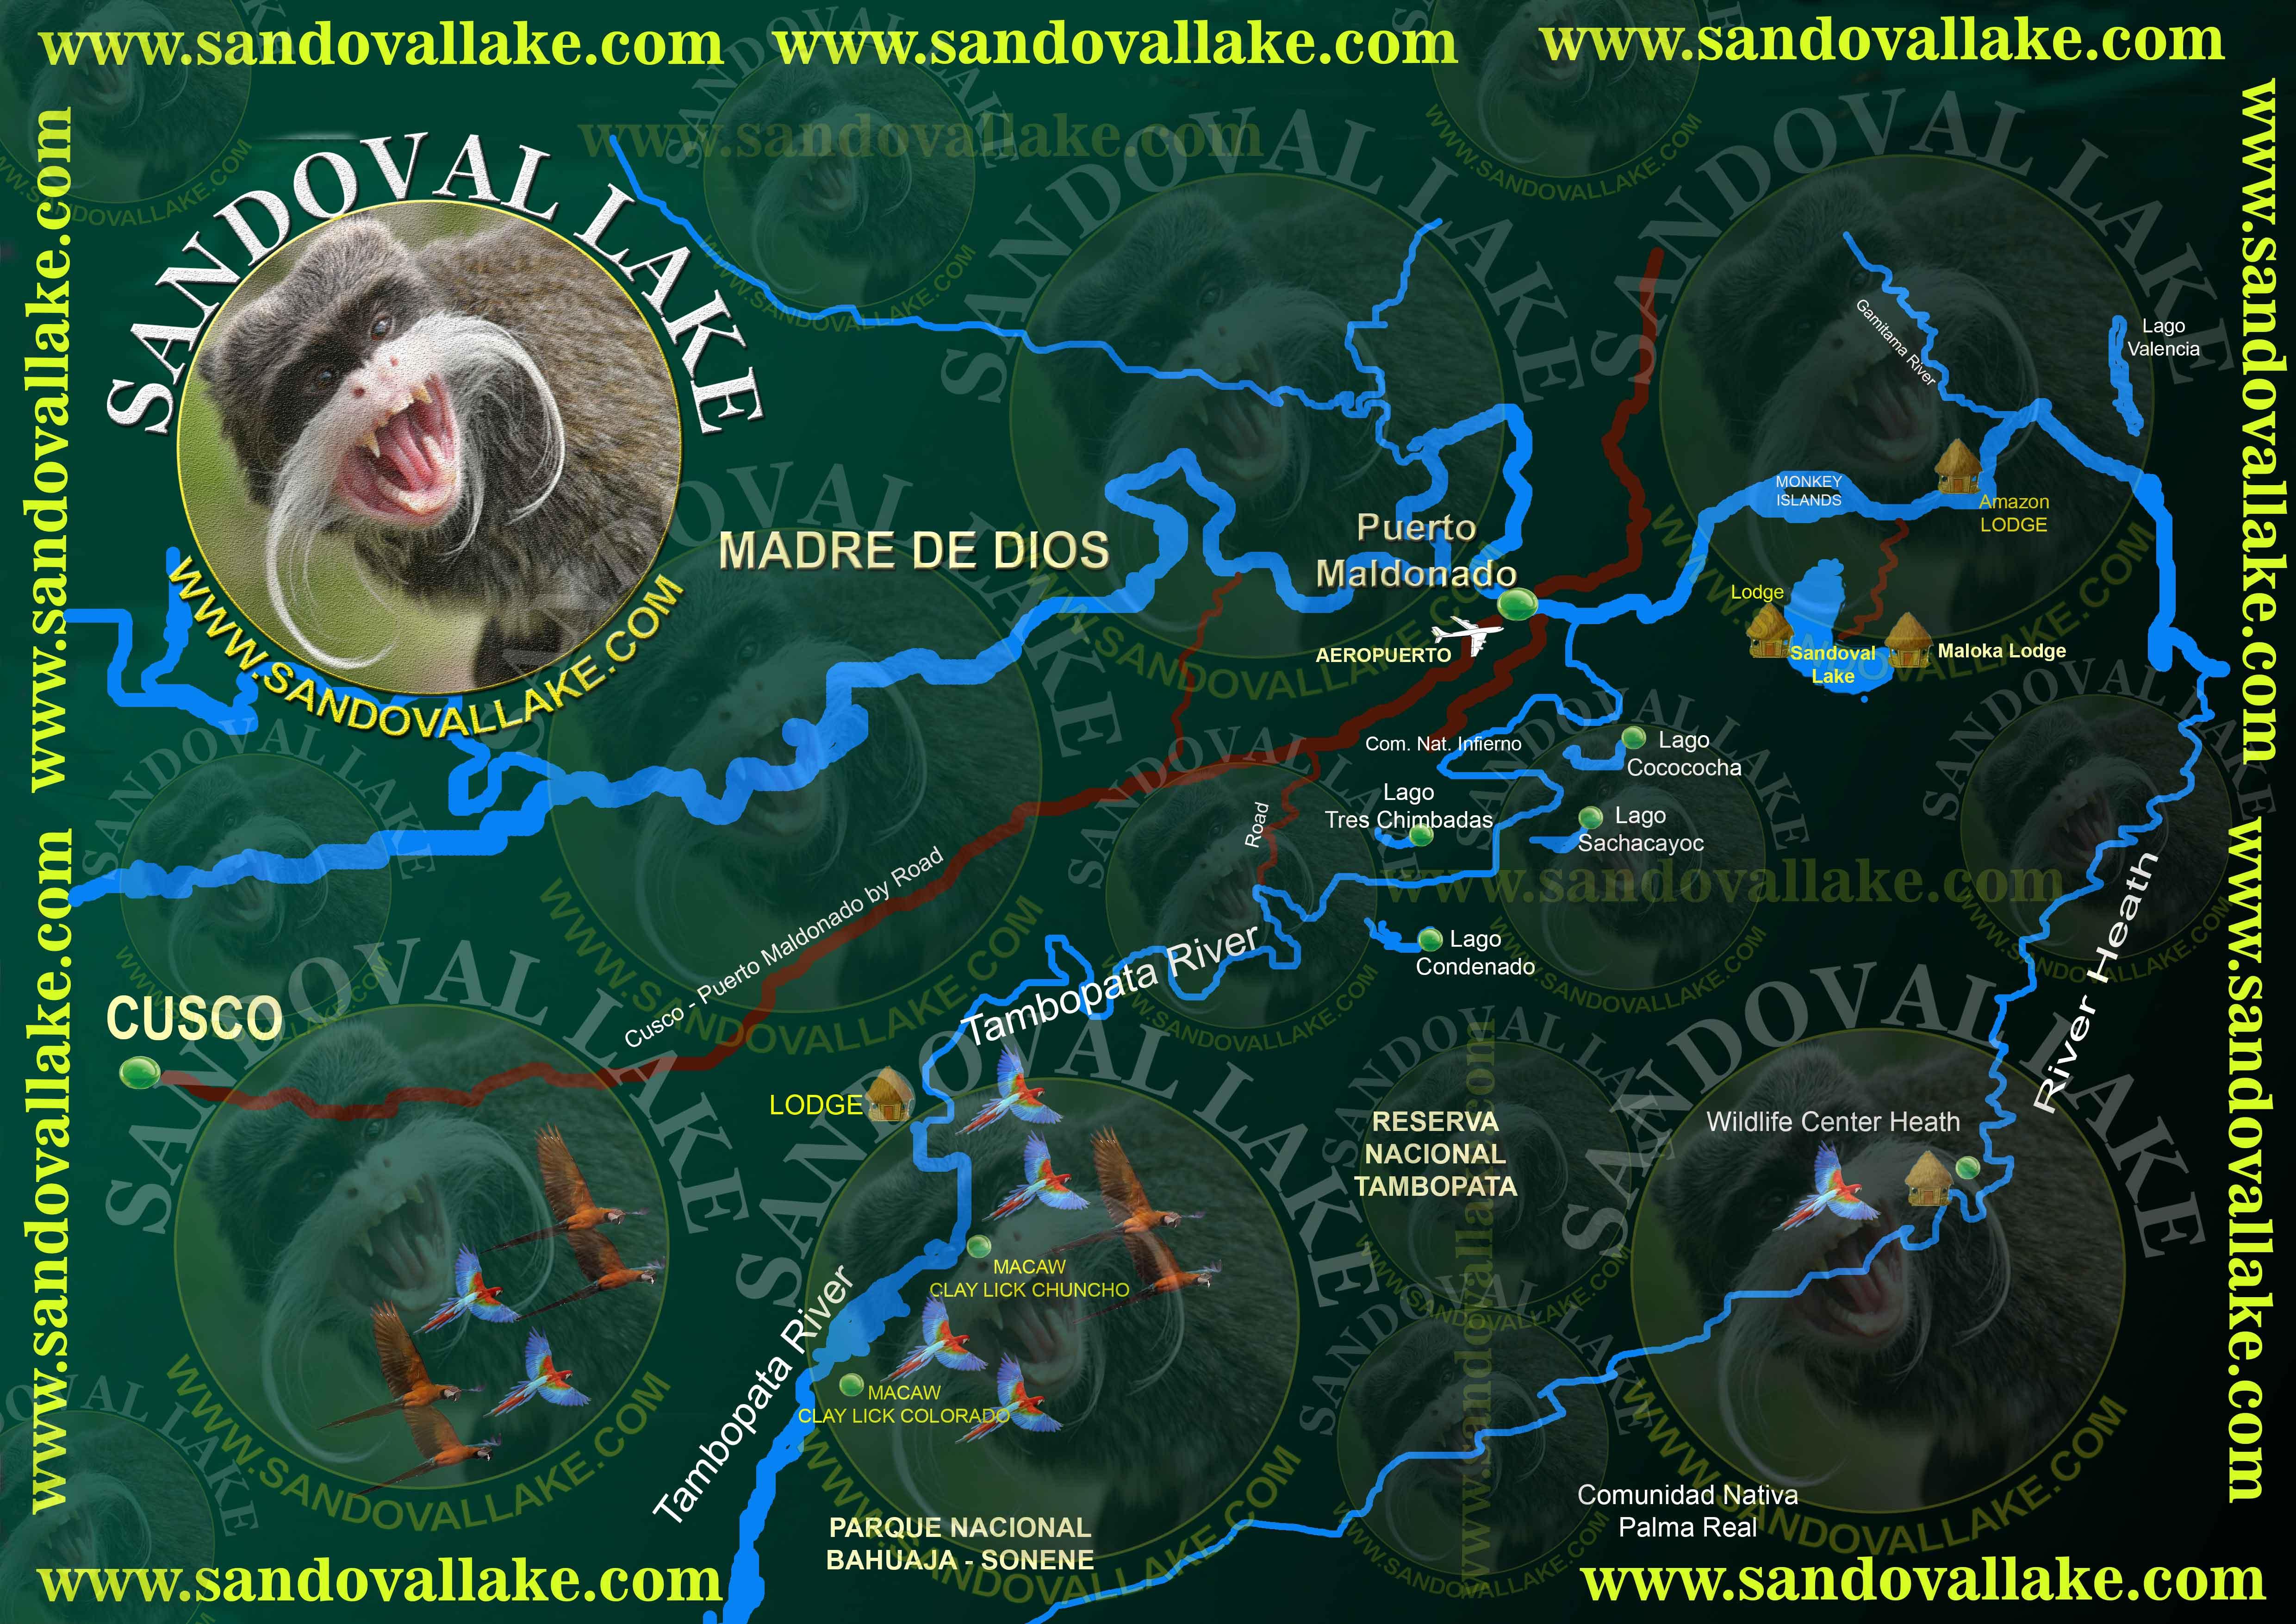 sandoval lake lodge amazon peru, sandoval lake reserve, lake sandoval lodge, tambopata sandoval lake lodge